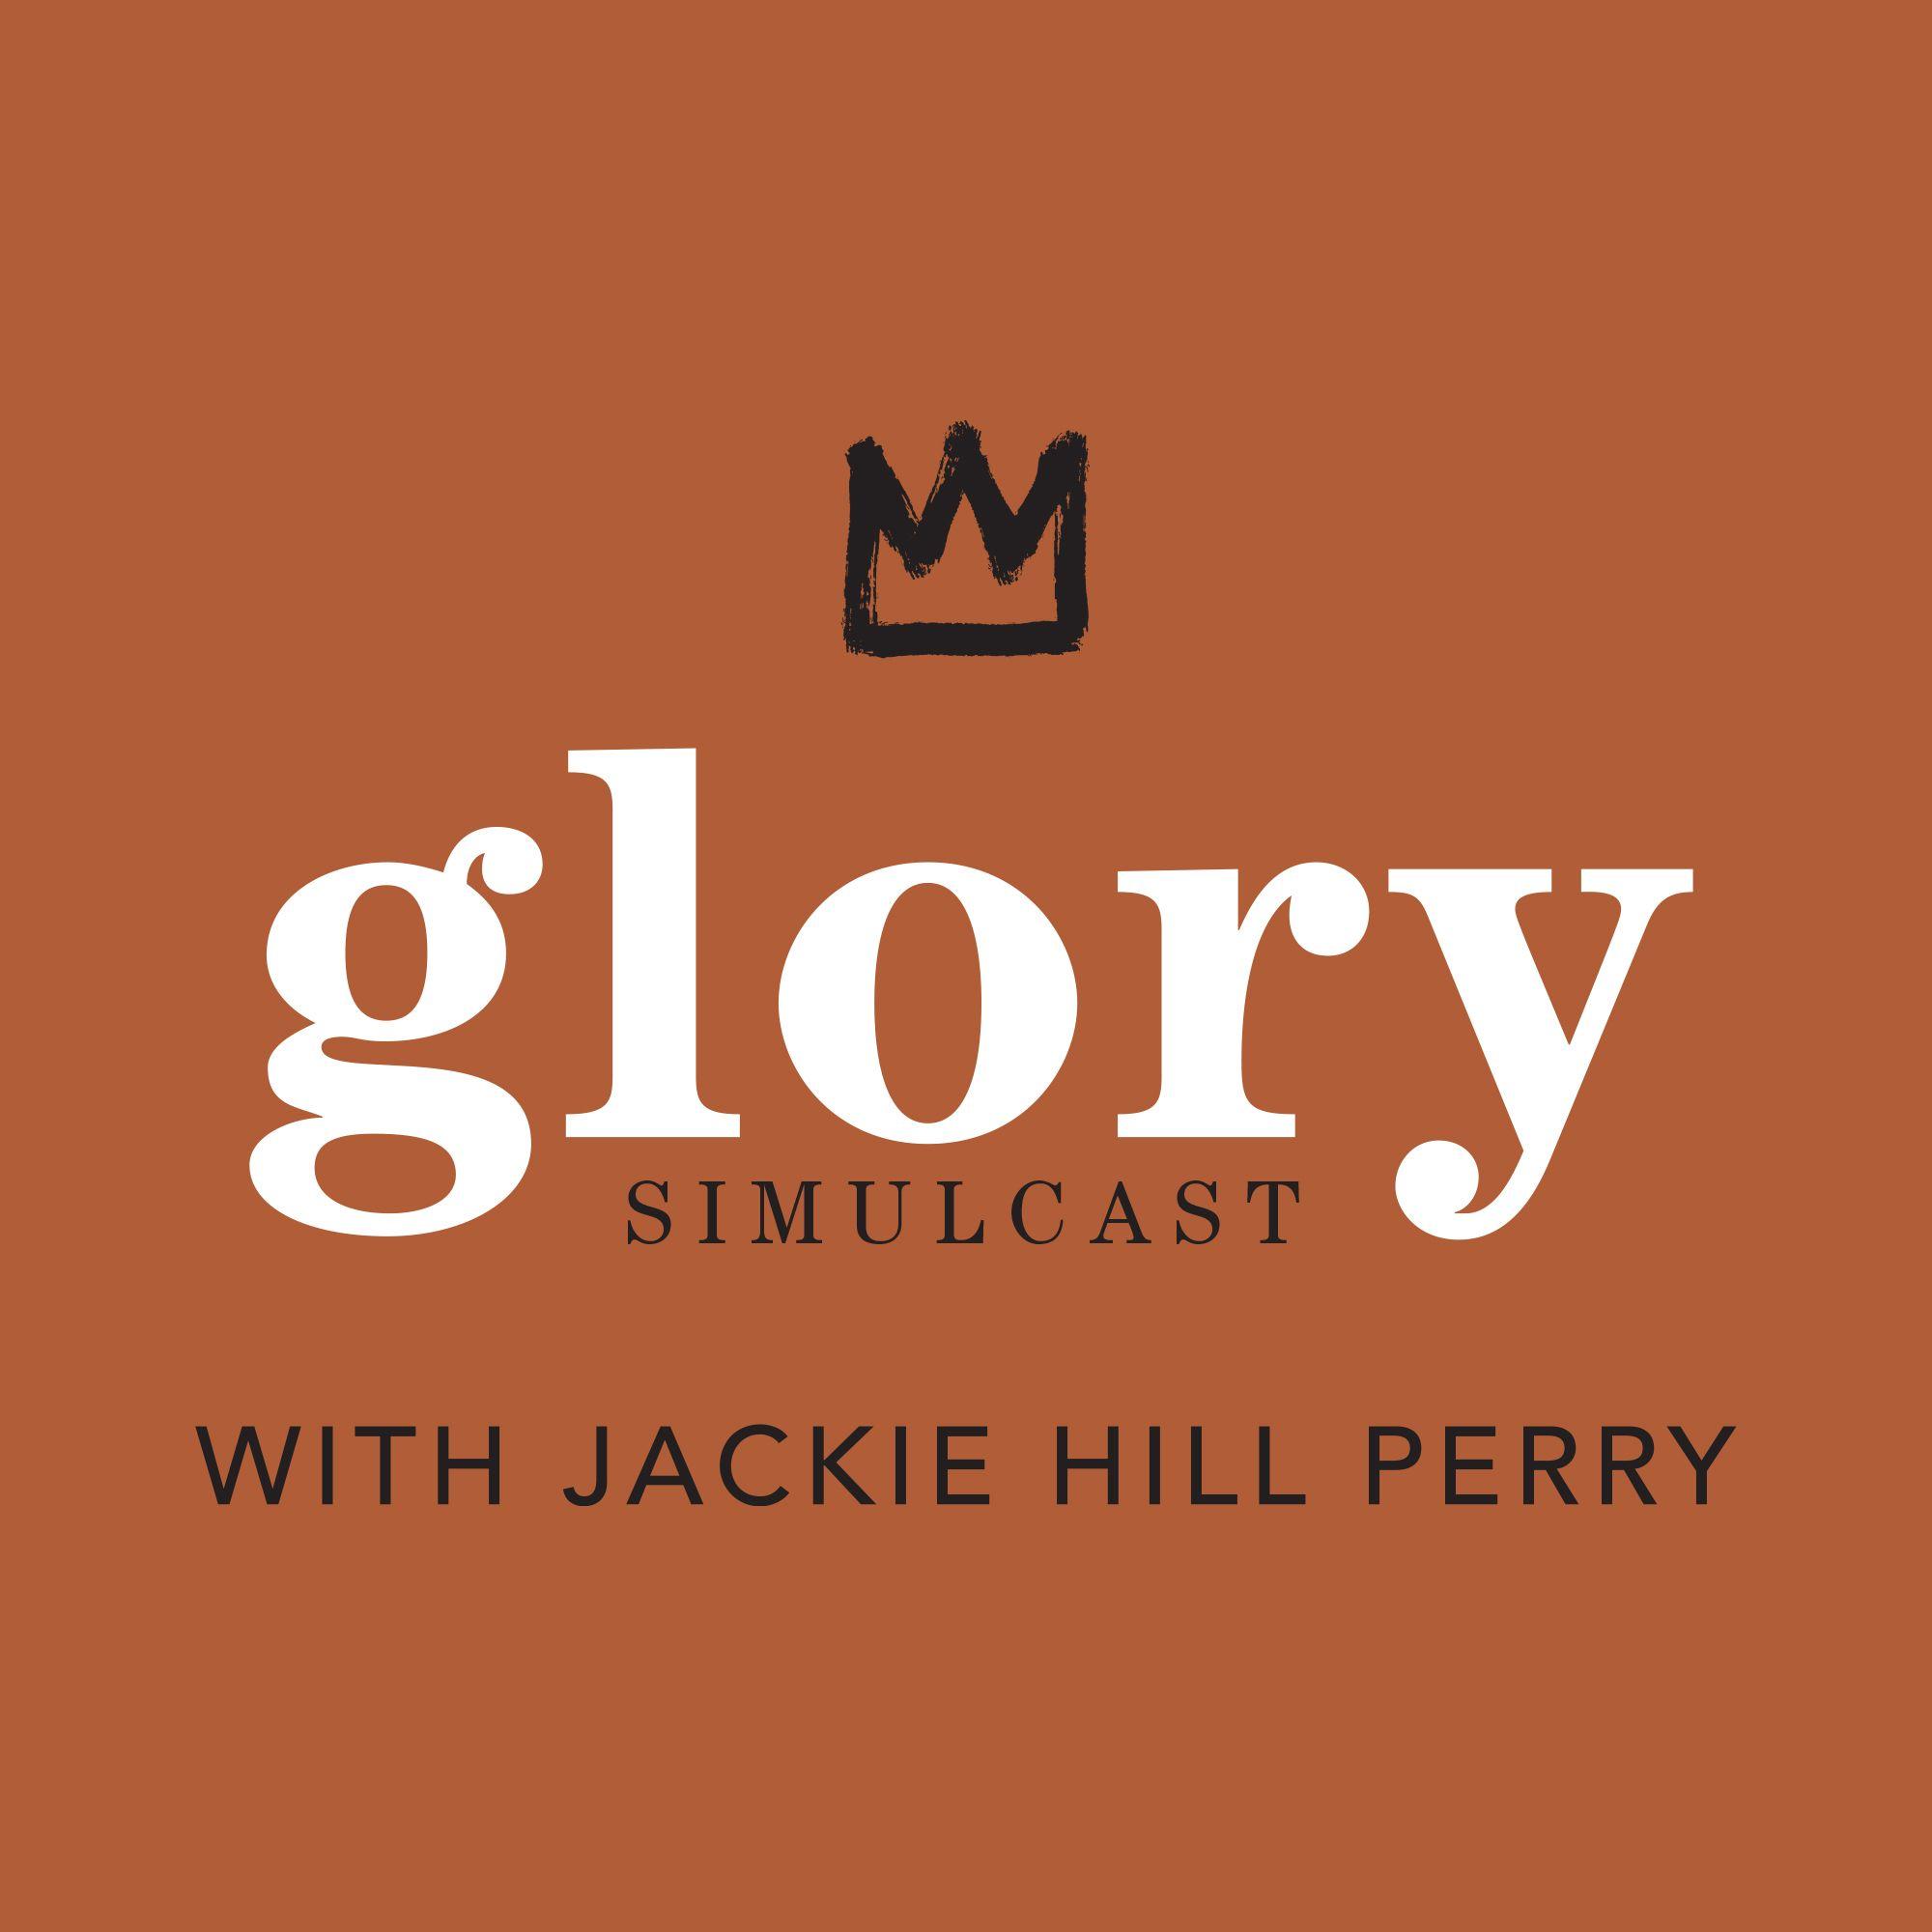 Glory Simulcast